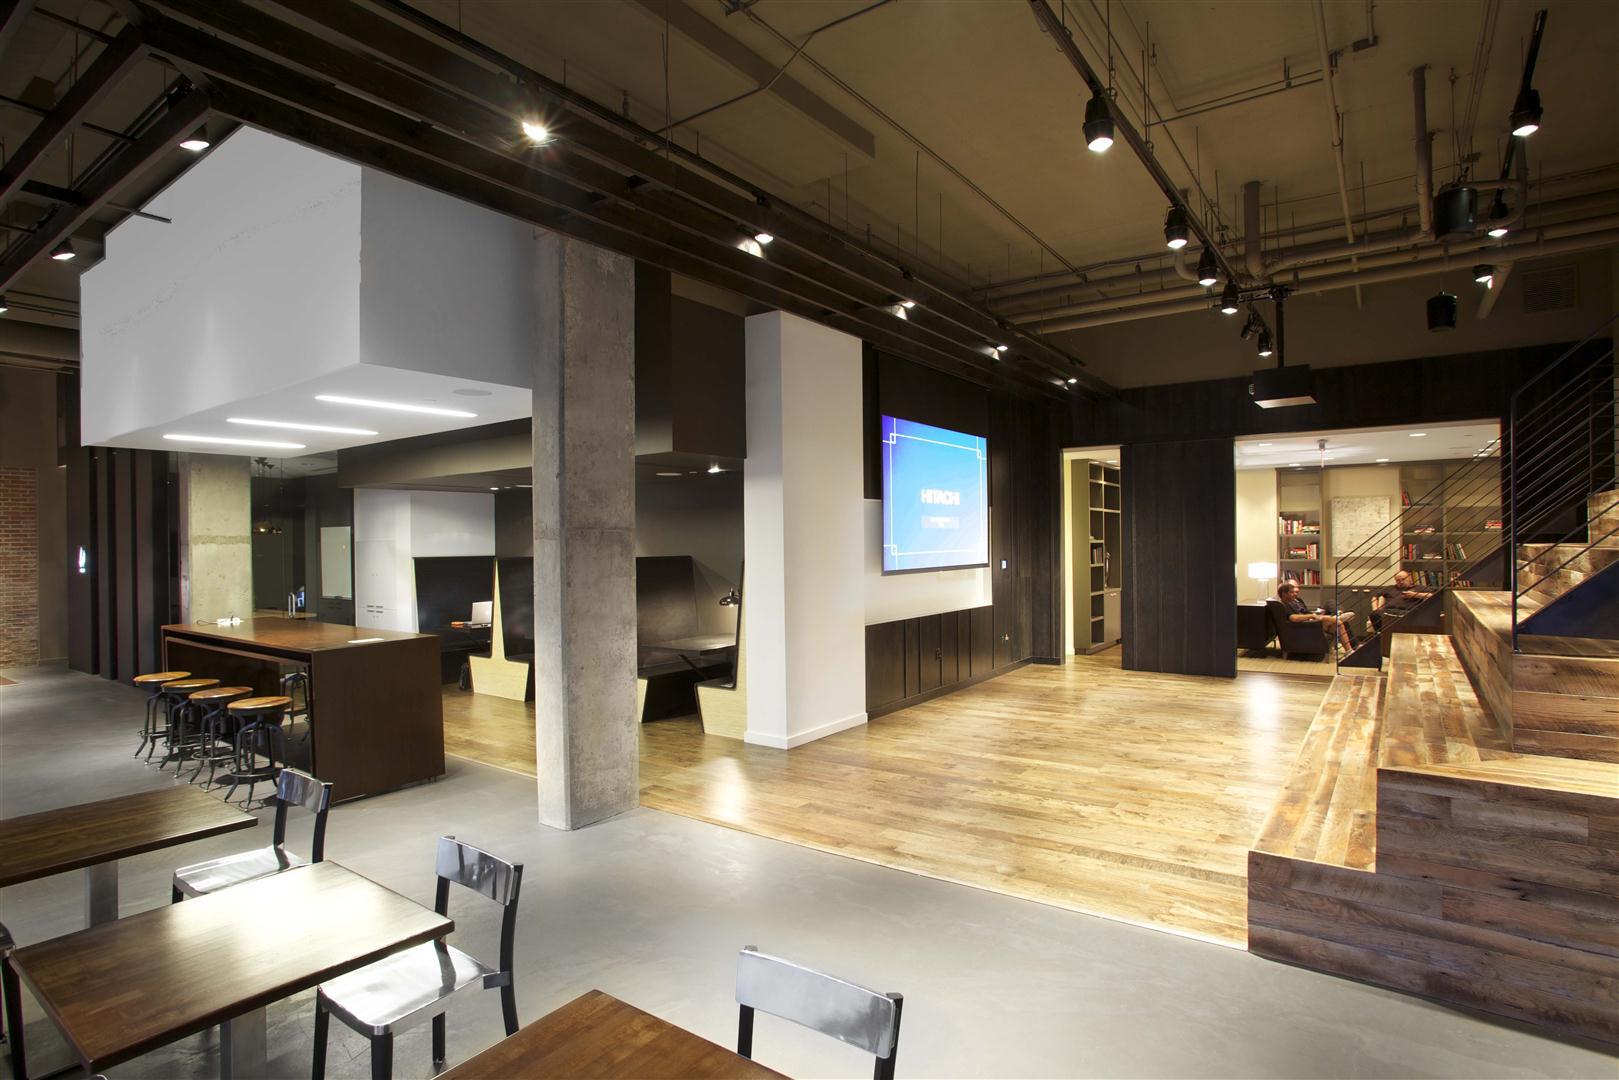 dropbox office san francisco. inside dropboxu0027s san francisco headquarters 1 dropbox office a